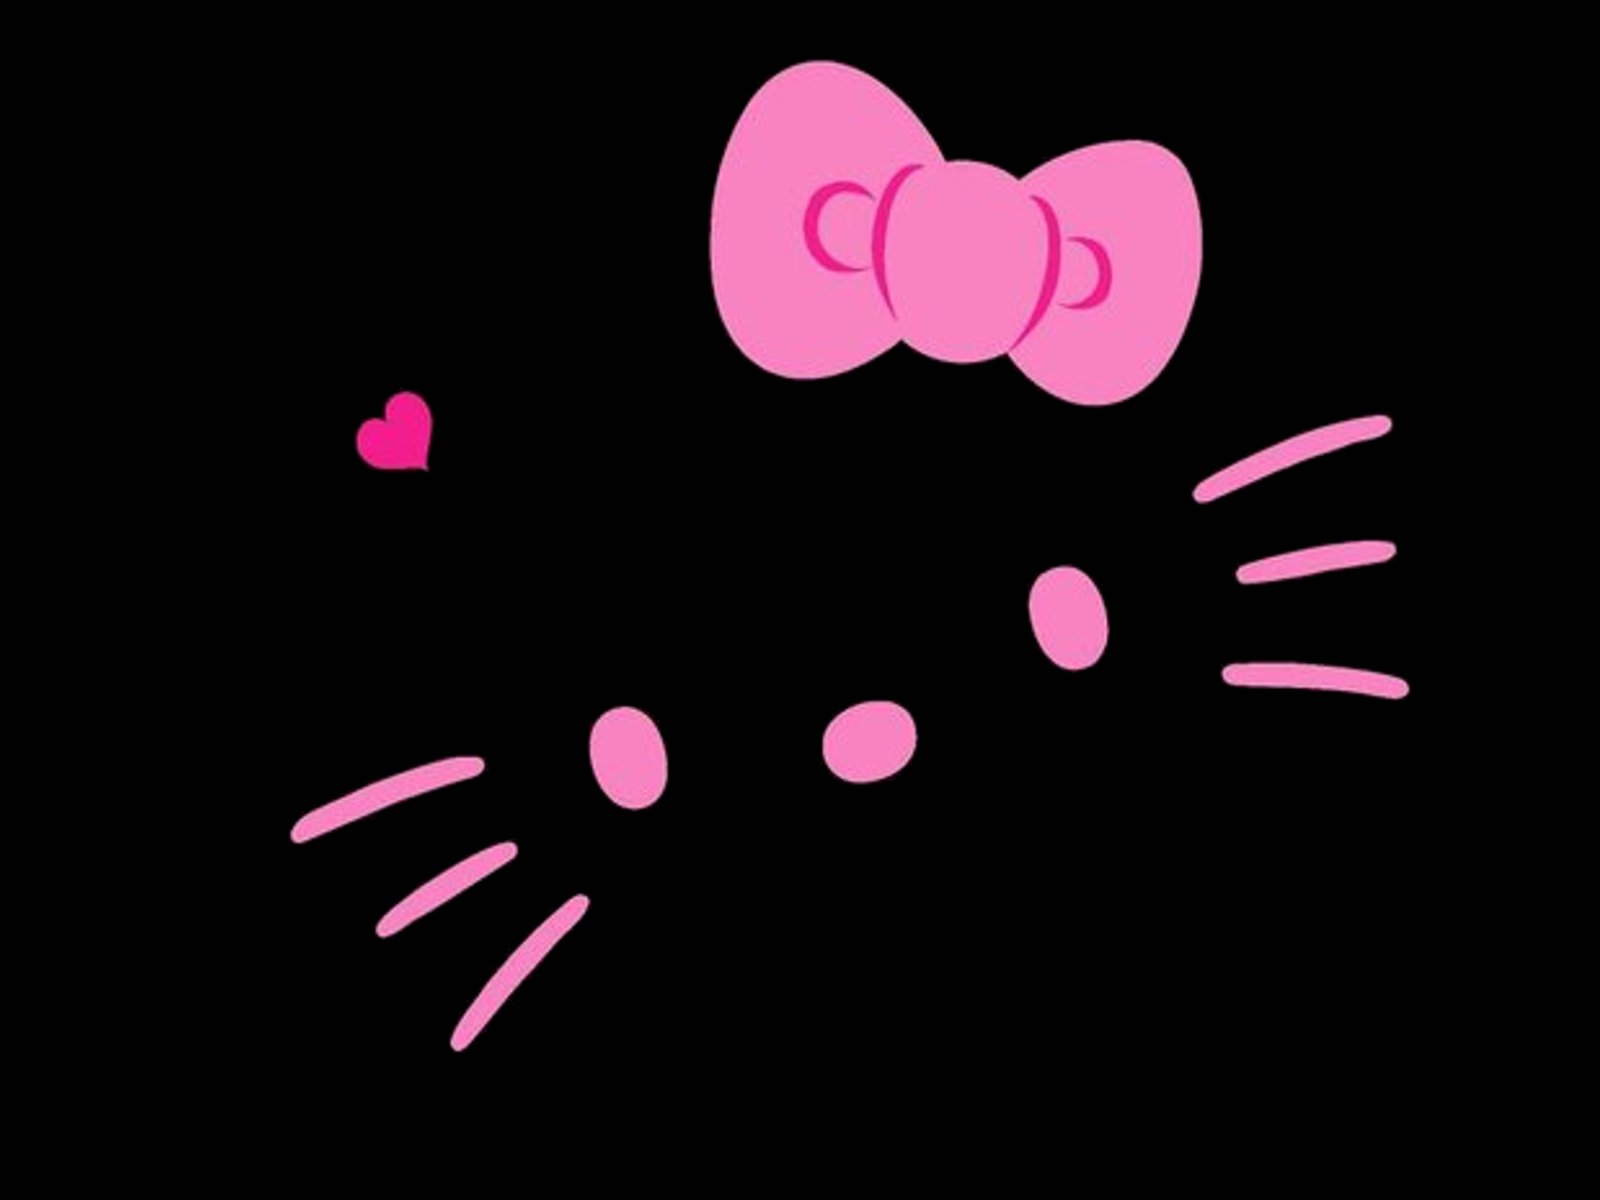 HELLO KITTY WALLPAPER CUTE hello kitty wallpaper 1600x1200